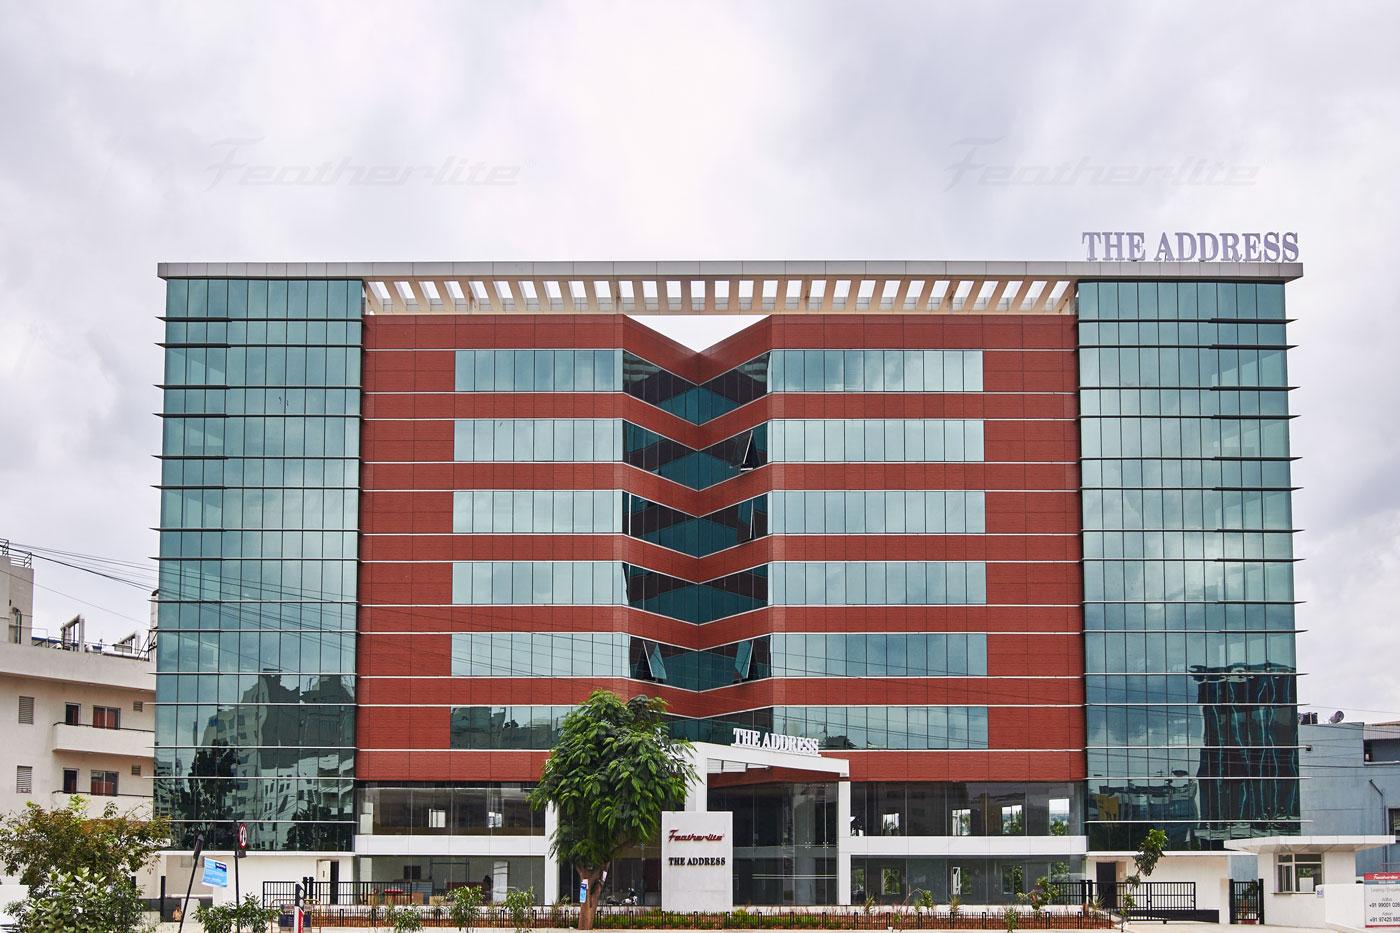 The Address - Evoma Business Center in Marathahalli, Bangalore